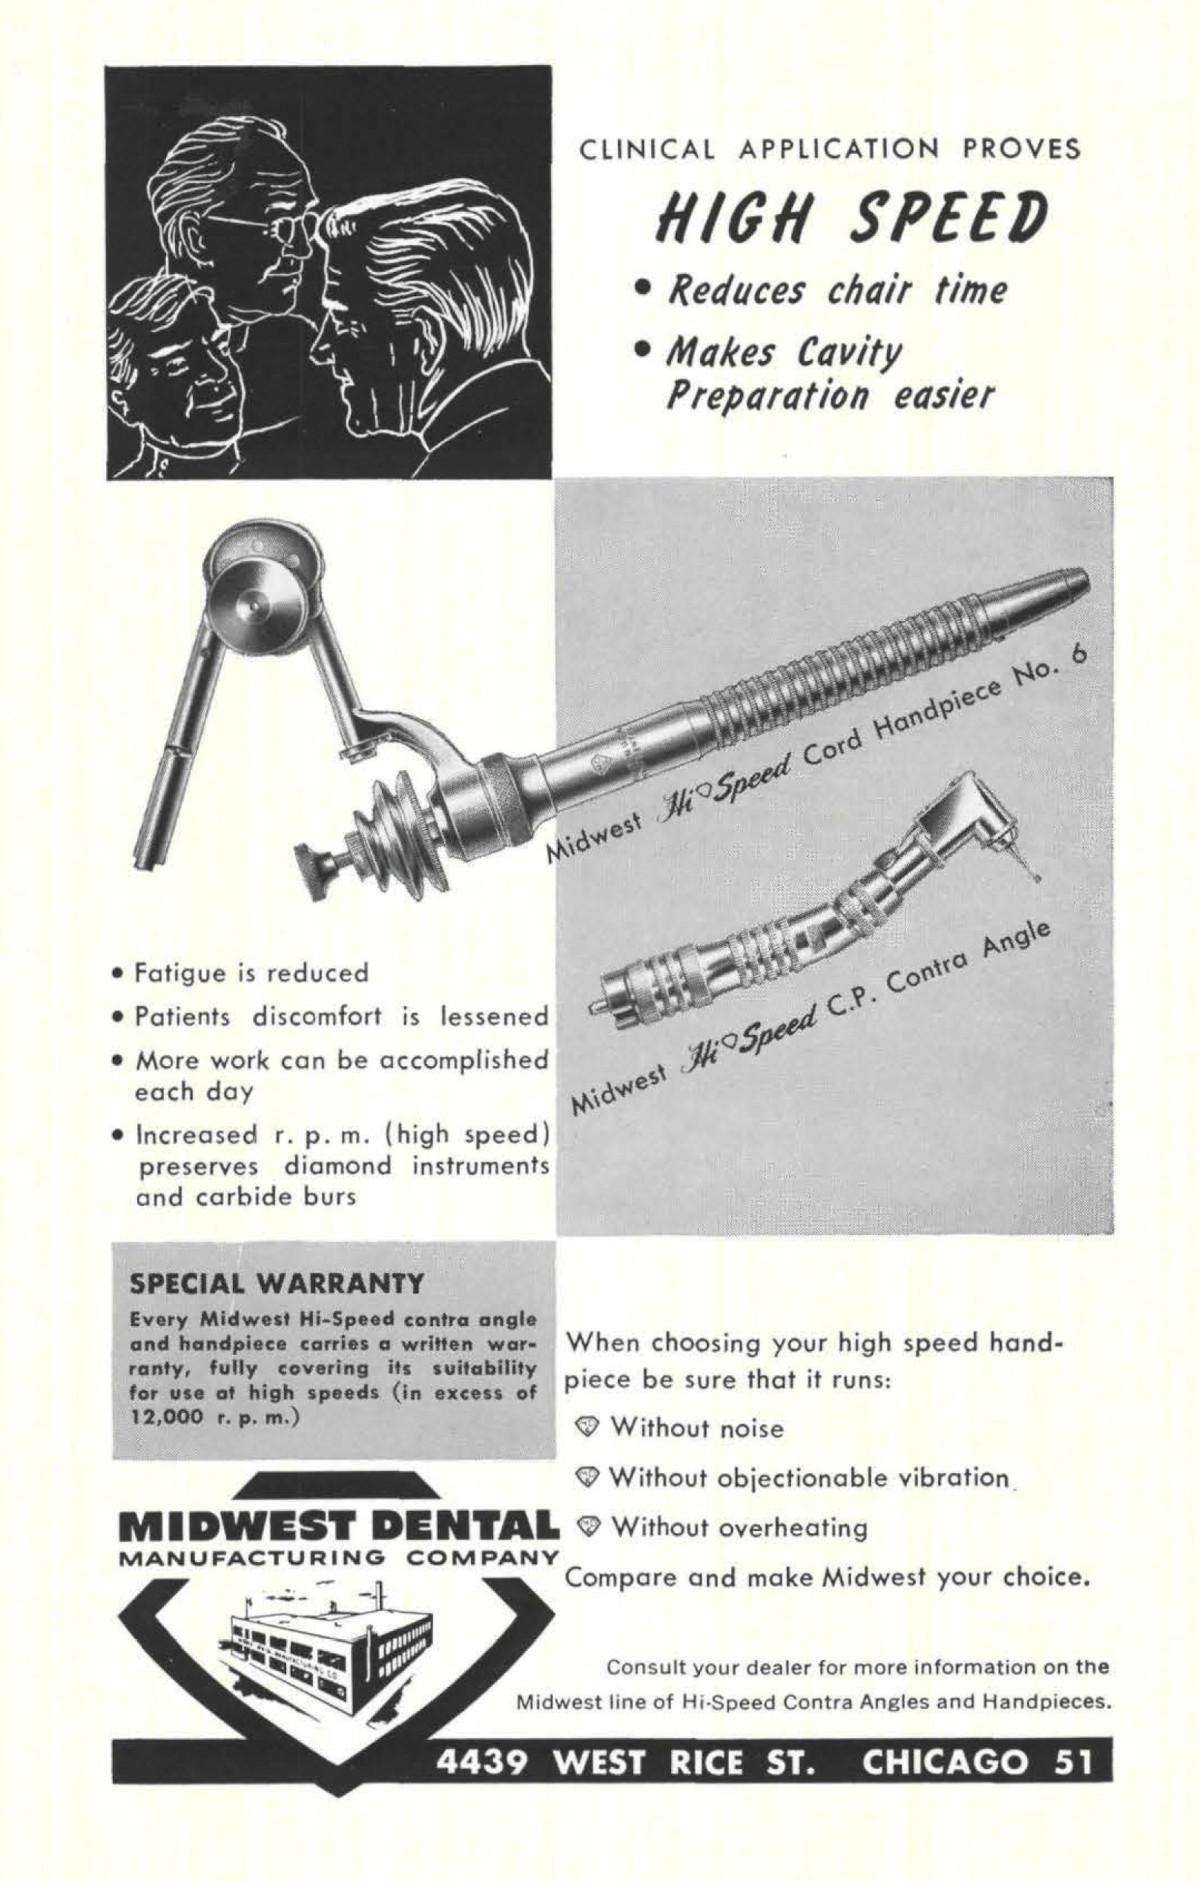 1954 Ad